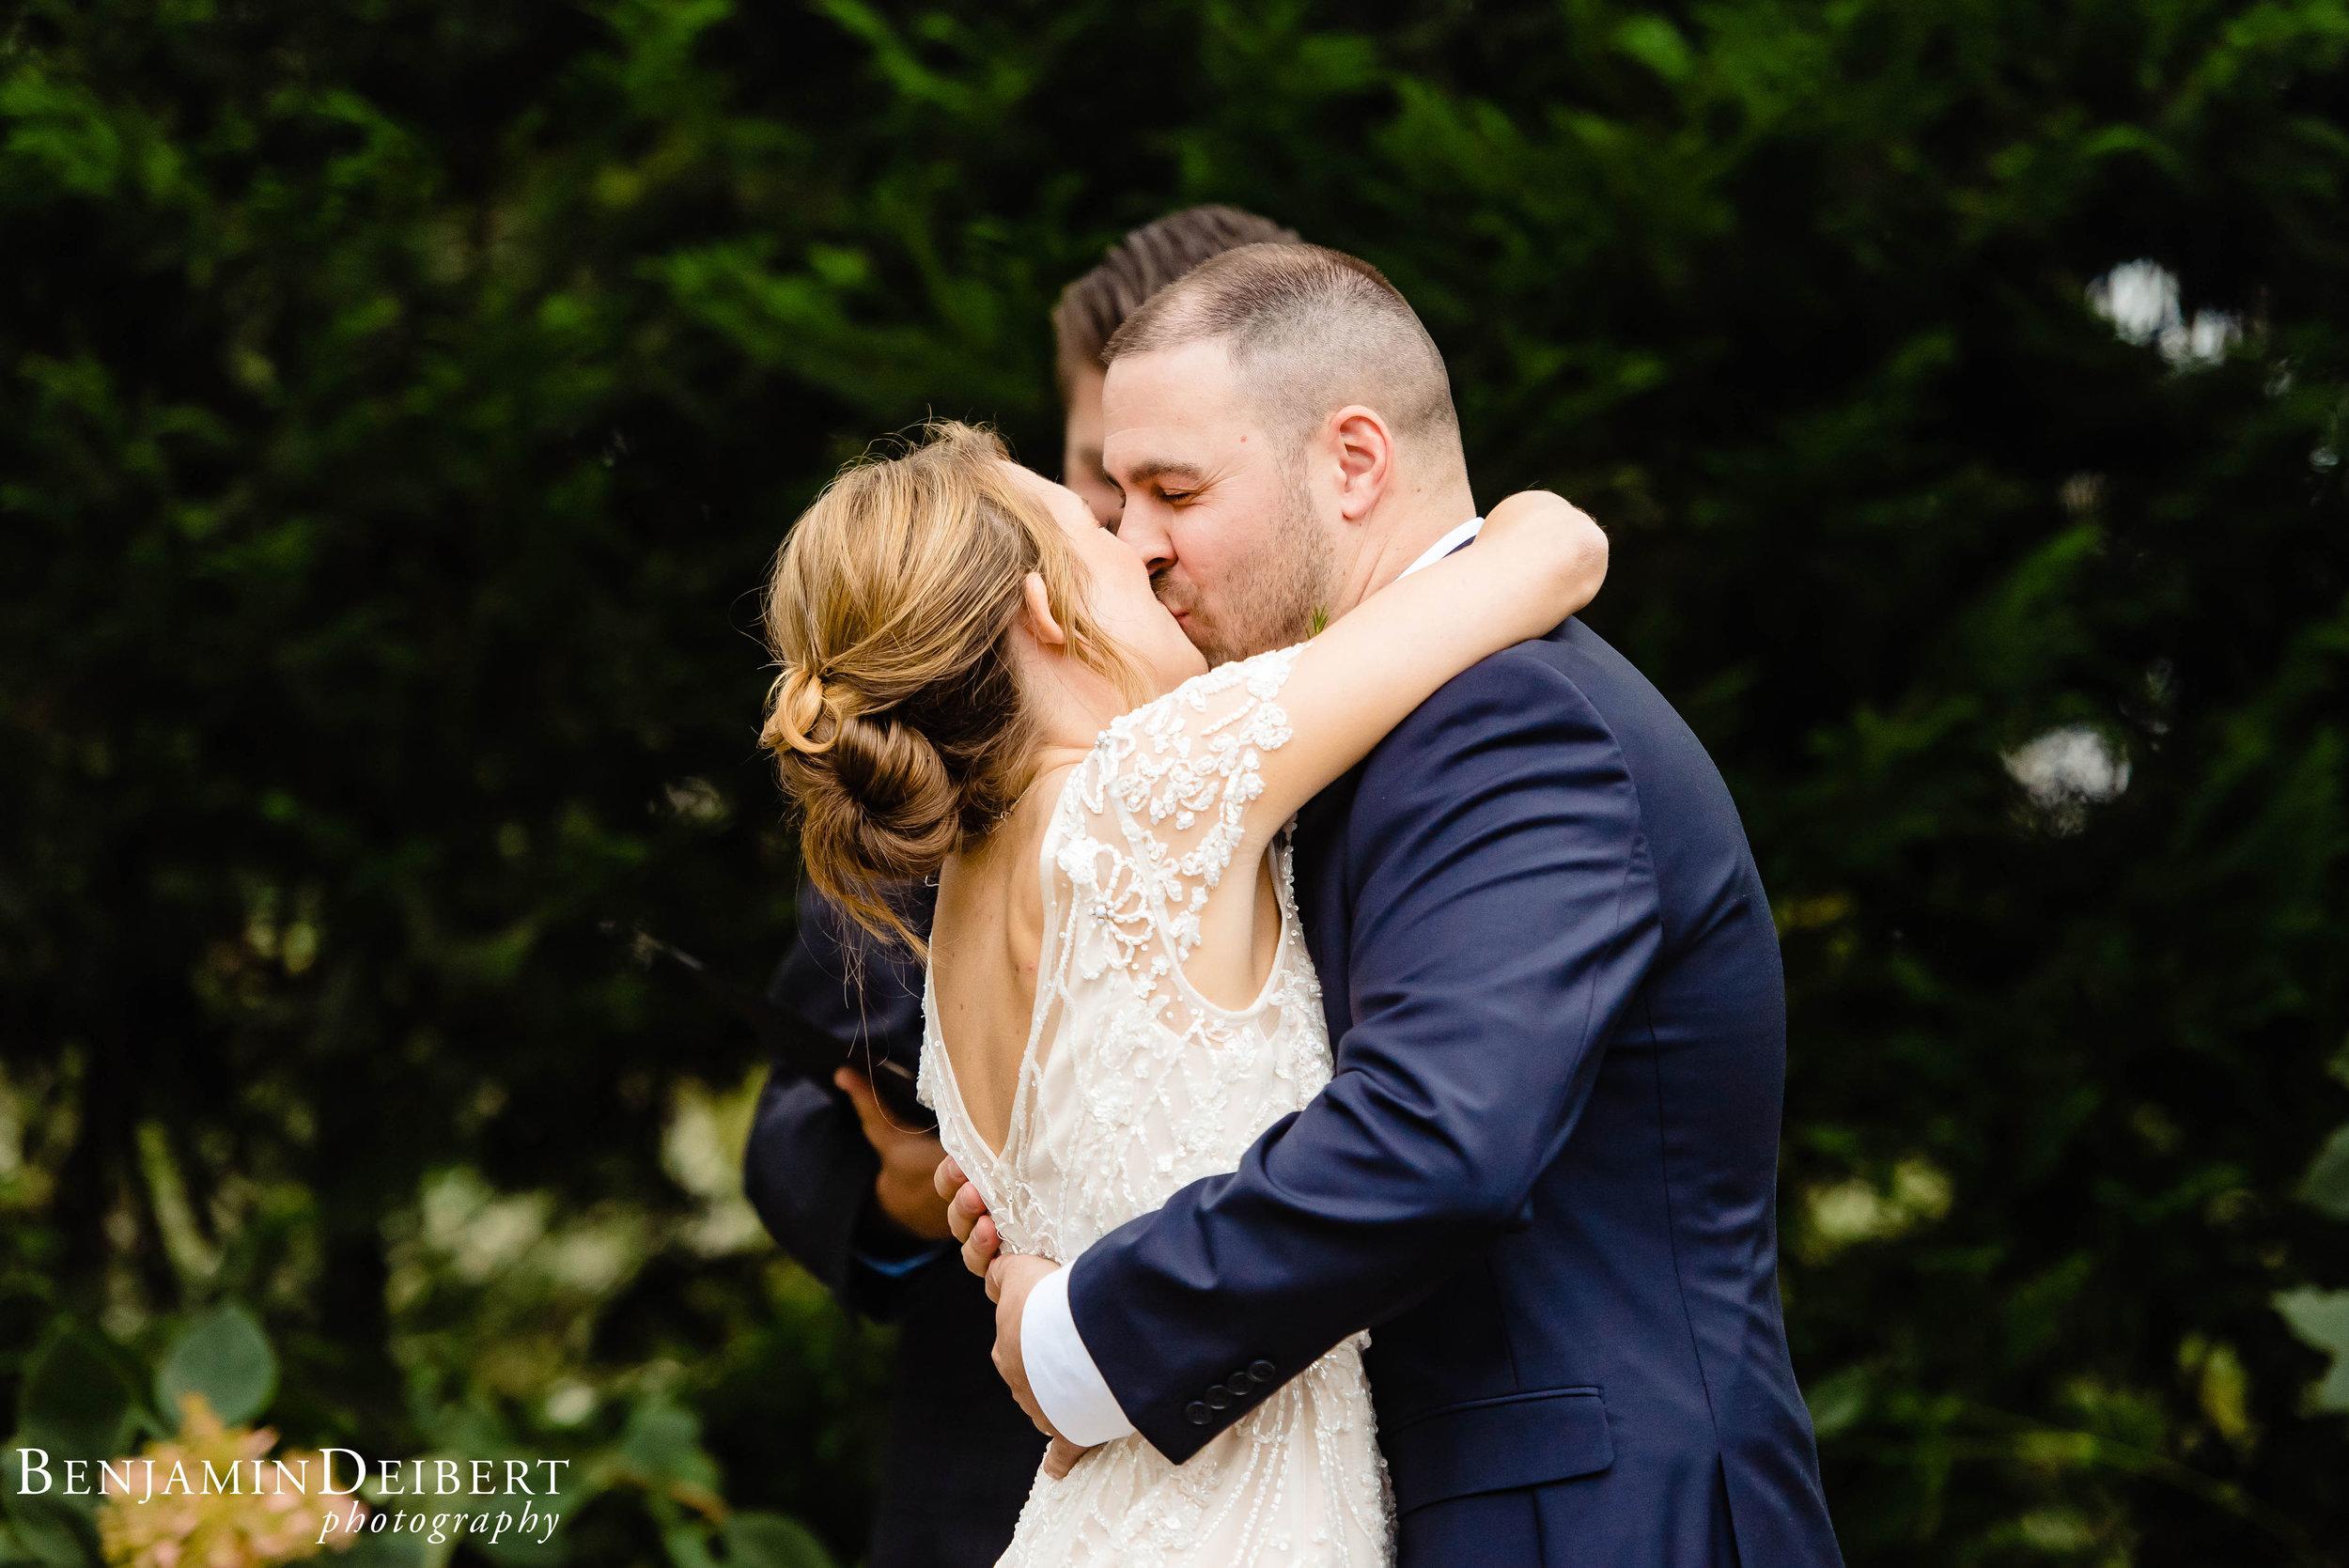 AllisonandMatt_BradfordEstate_Wedding-48.jpg